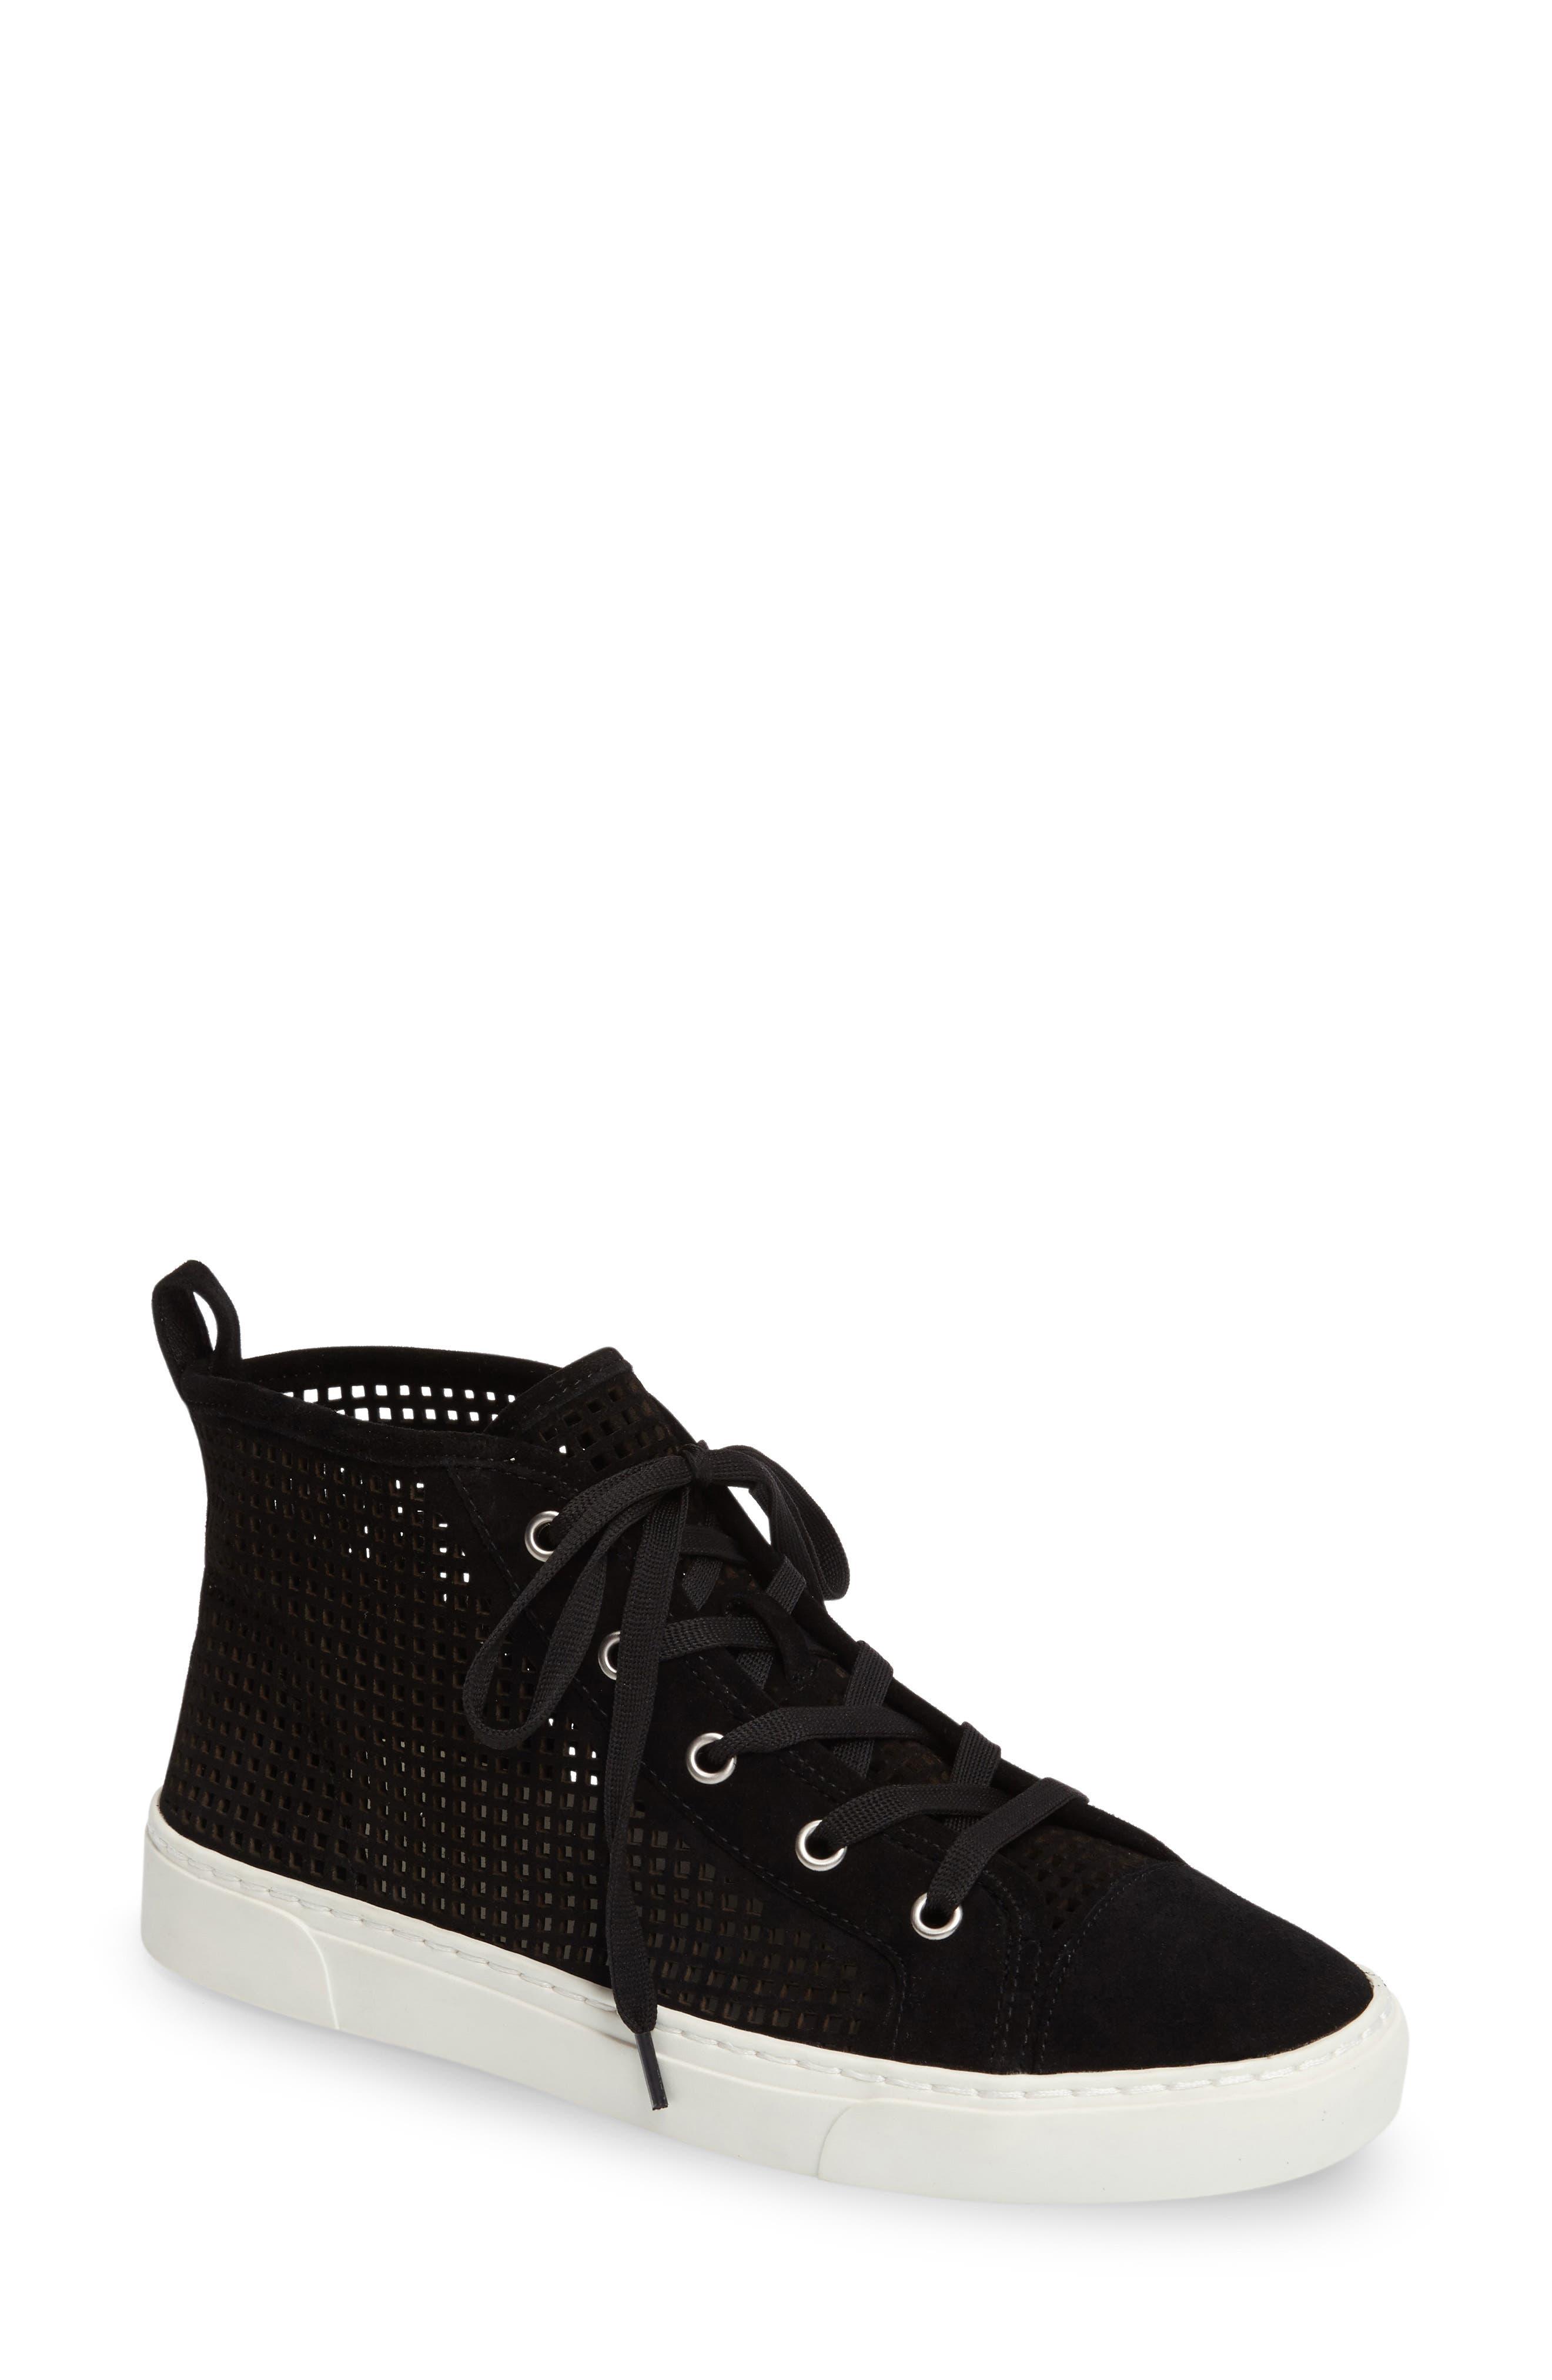 Dulcia Perforated High-Top Sneaker,                             Main thumbnail 1, color,                             001